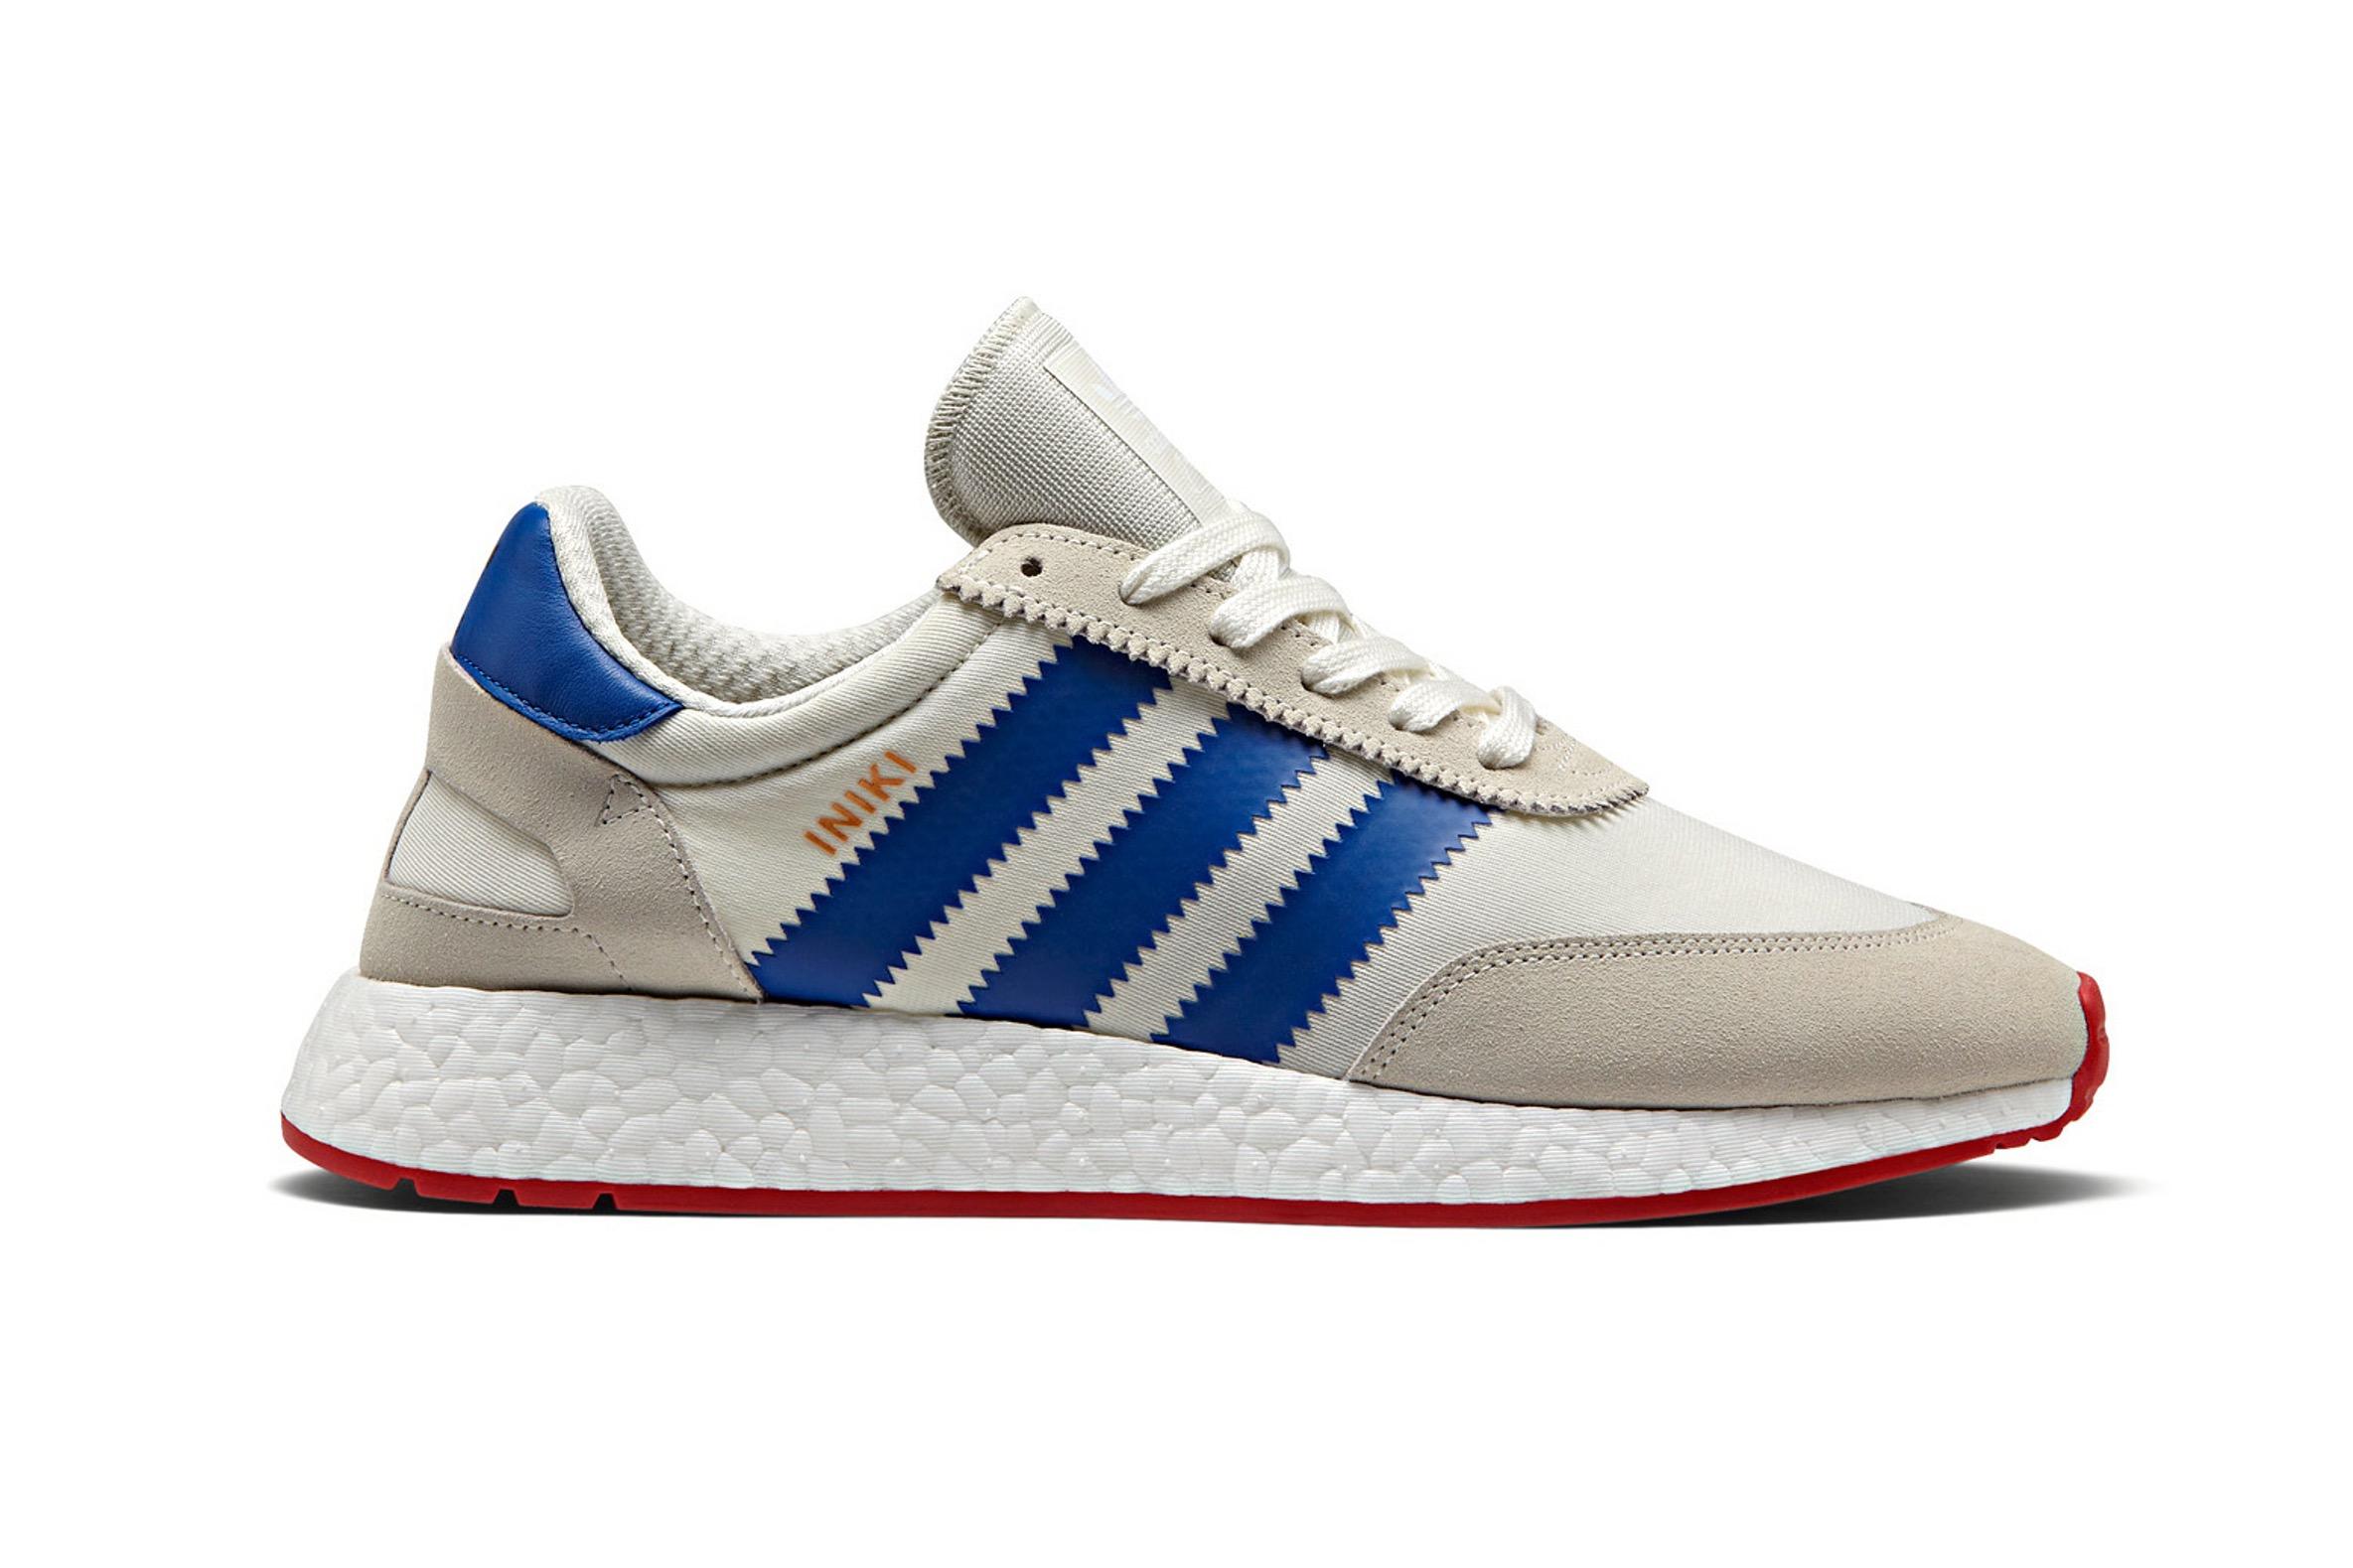 Adidas Originals sort sa Iniki Runner au look des années 70